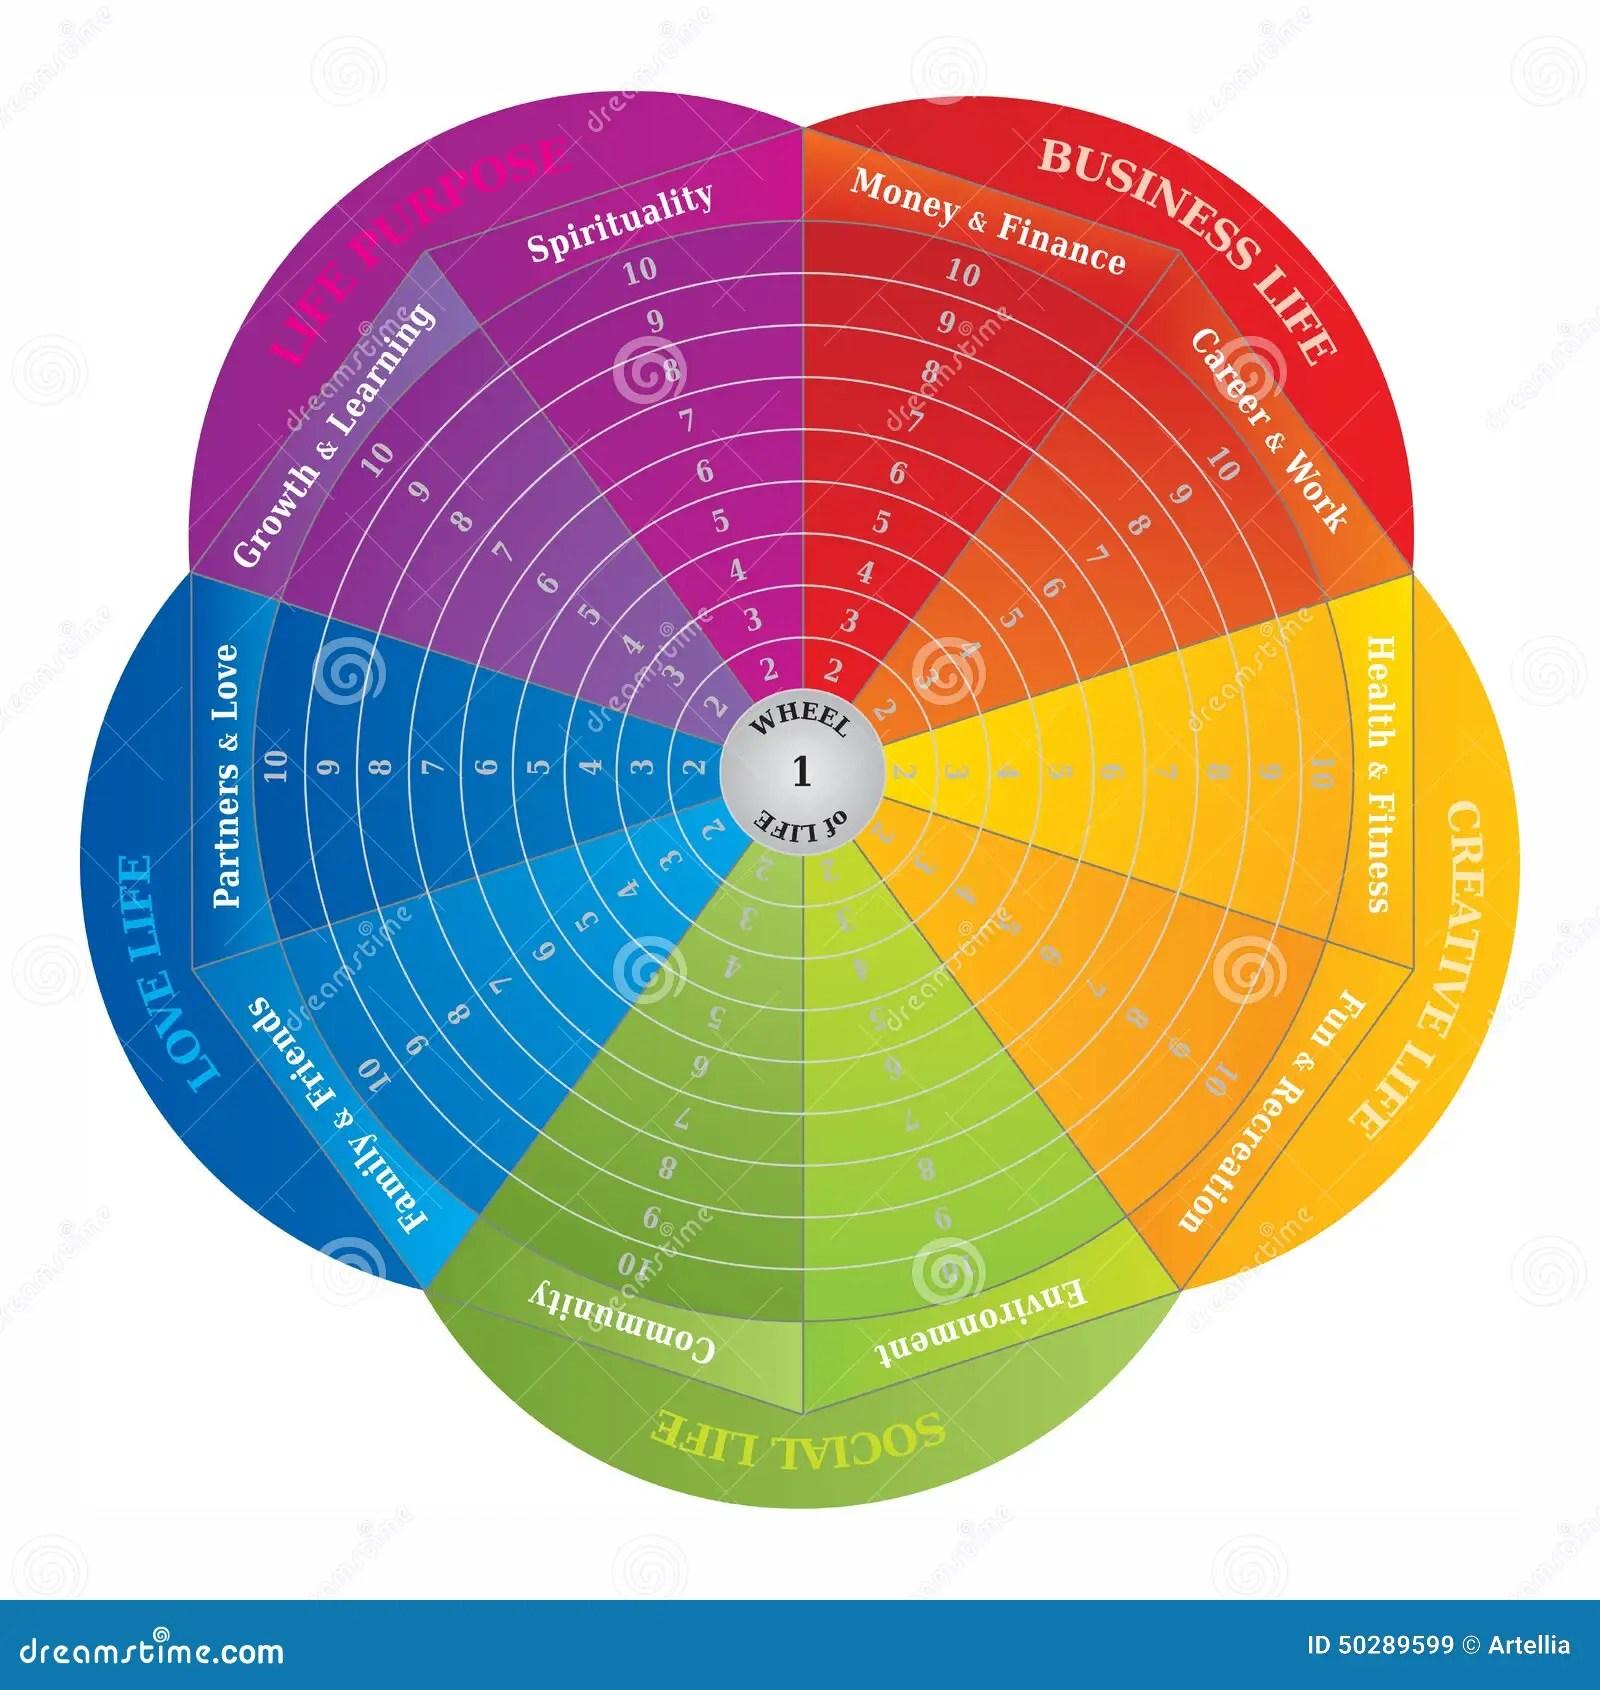 flower diagram career refrigerator wiring compressor wheel of life coaching tool in rainbow colors